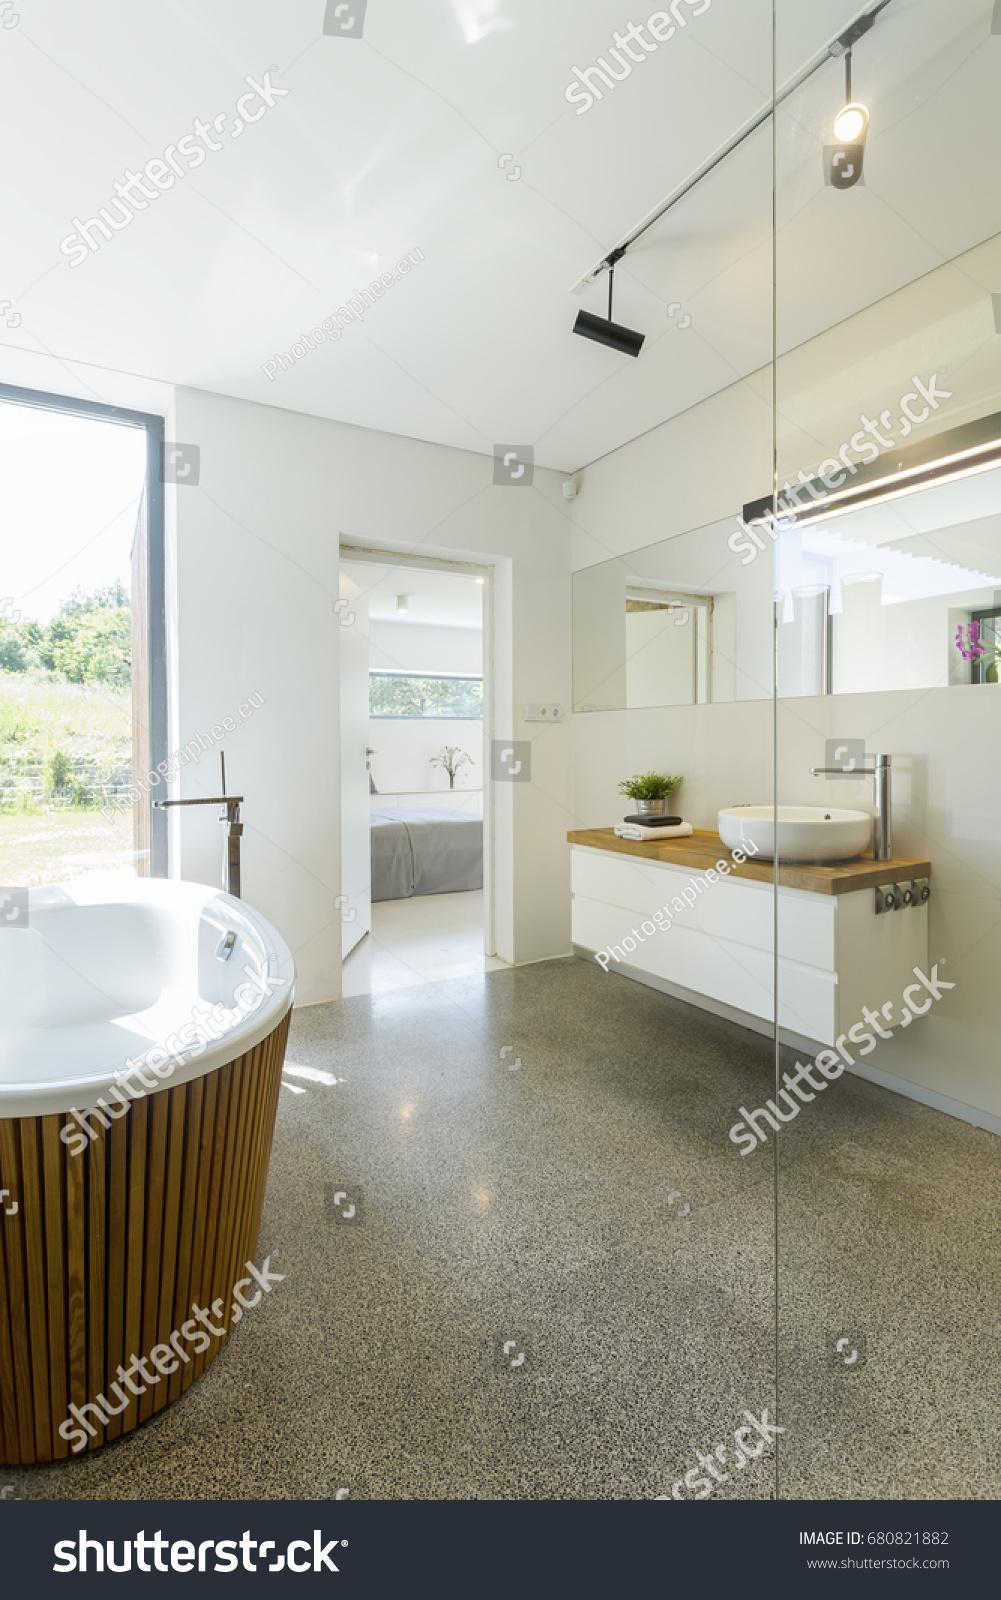 Bright Simple Bathroom Design Granite Floor Stock Photo (Download ...